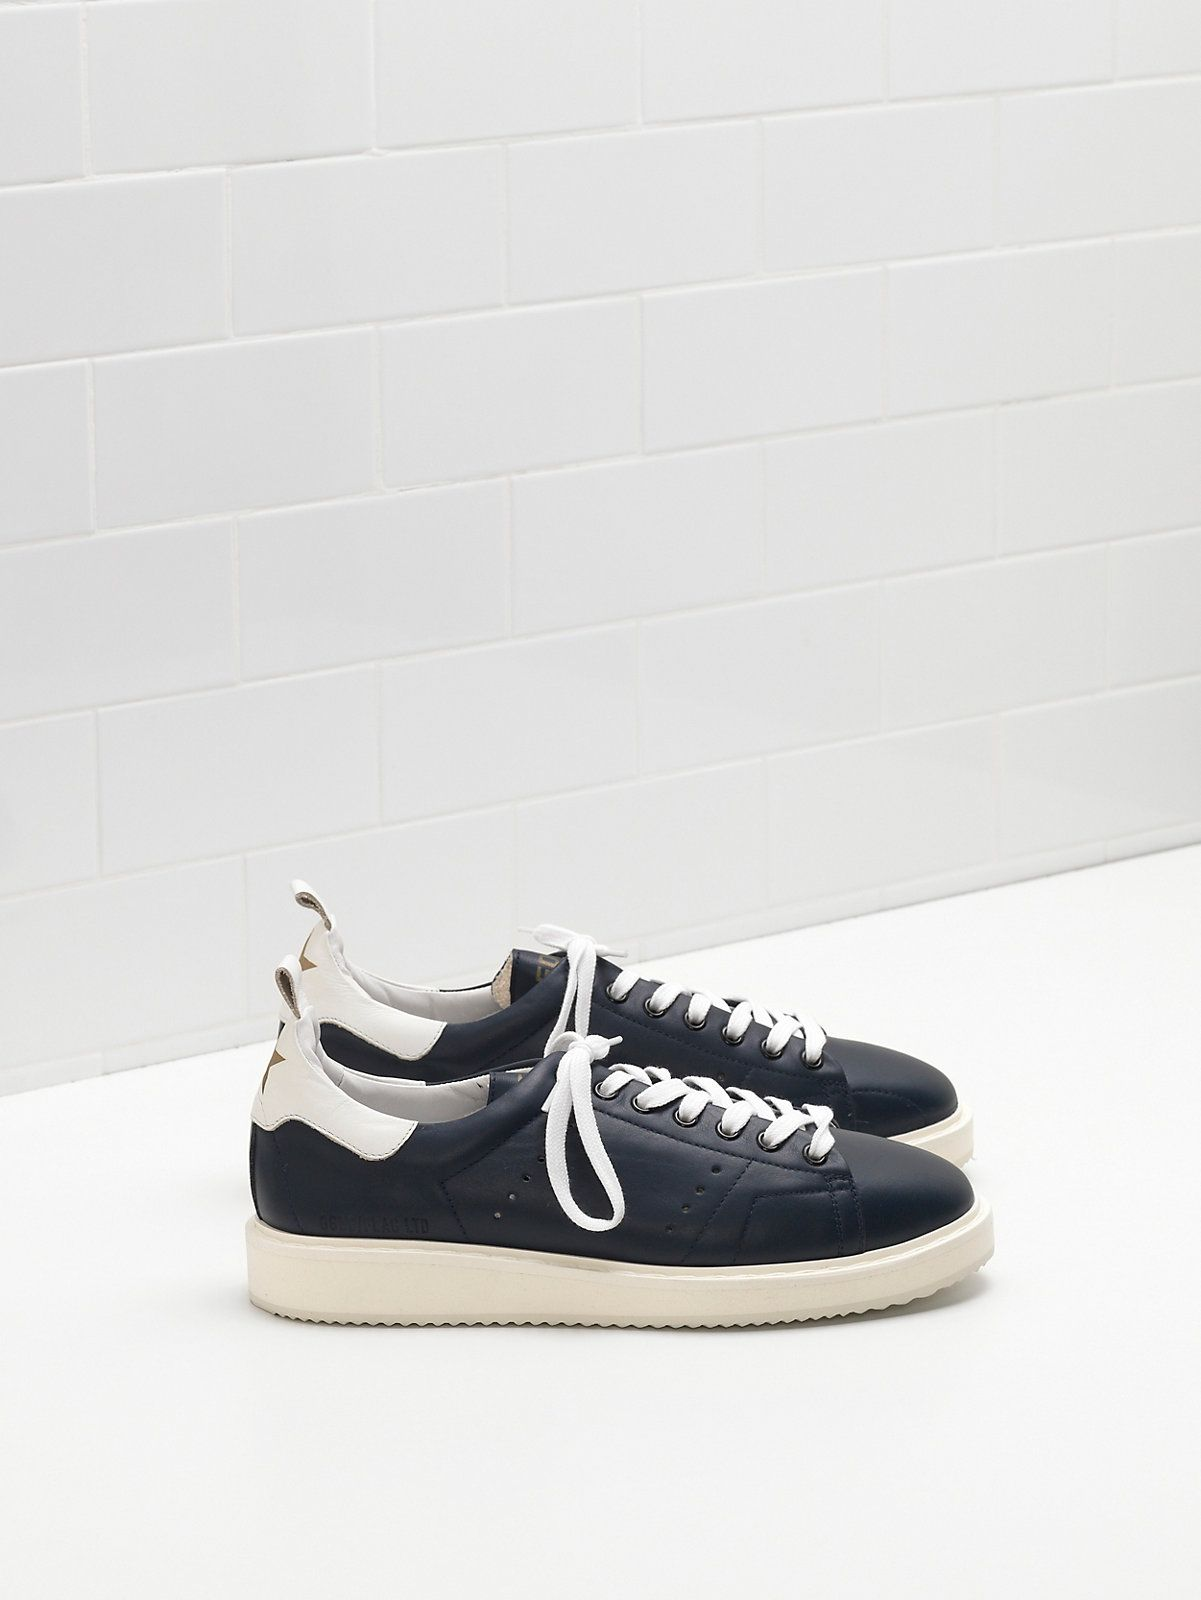 Starter | Sneaker outlet, Golden goose, Sneakers